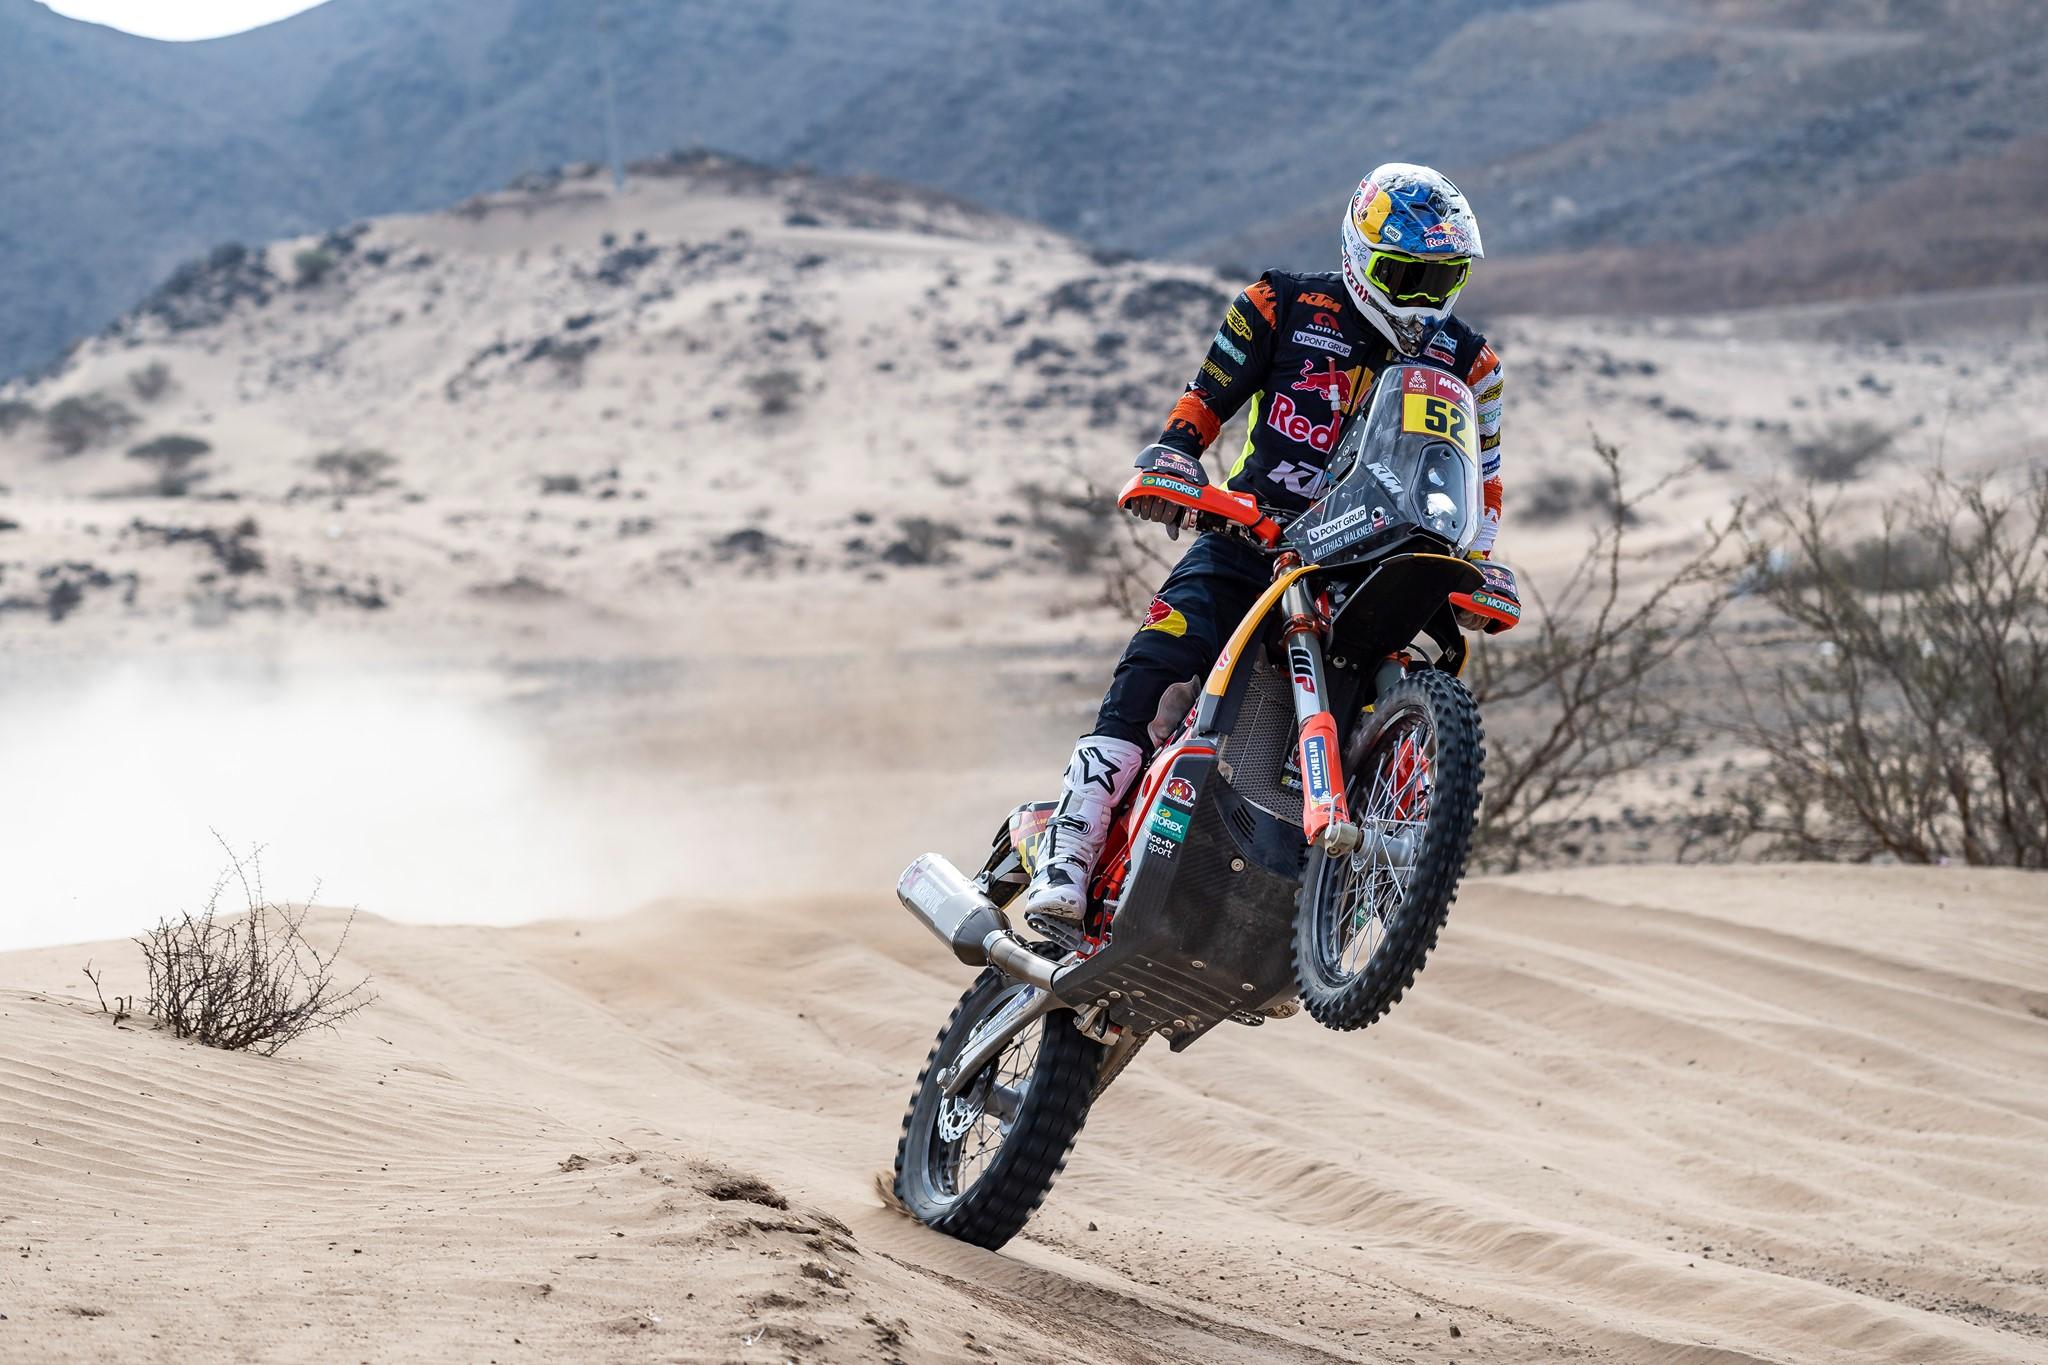 Dakar et rally-raid - Page 12 134850295_248879116596496_5976691456407895684_o-1